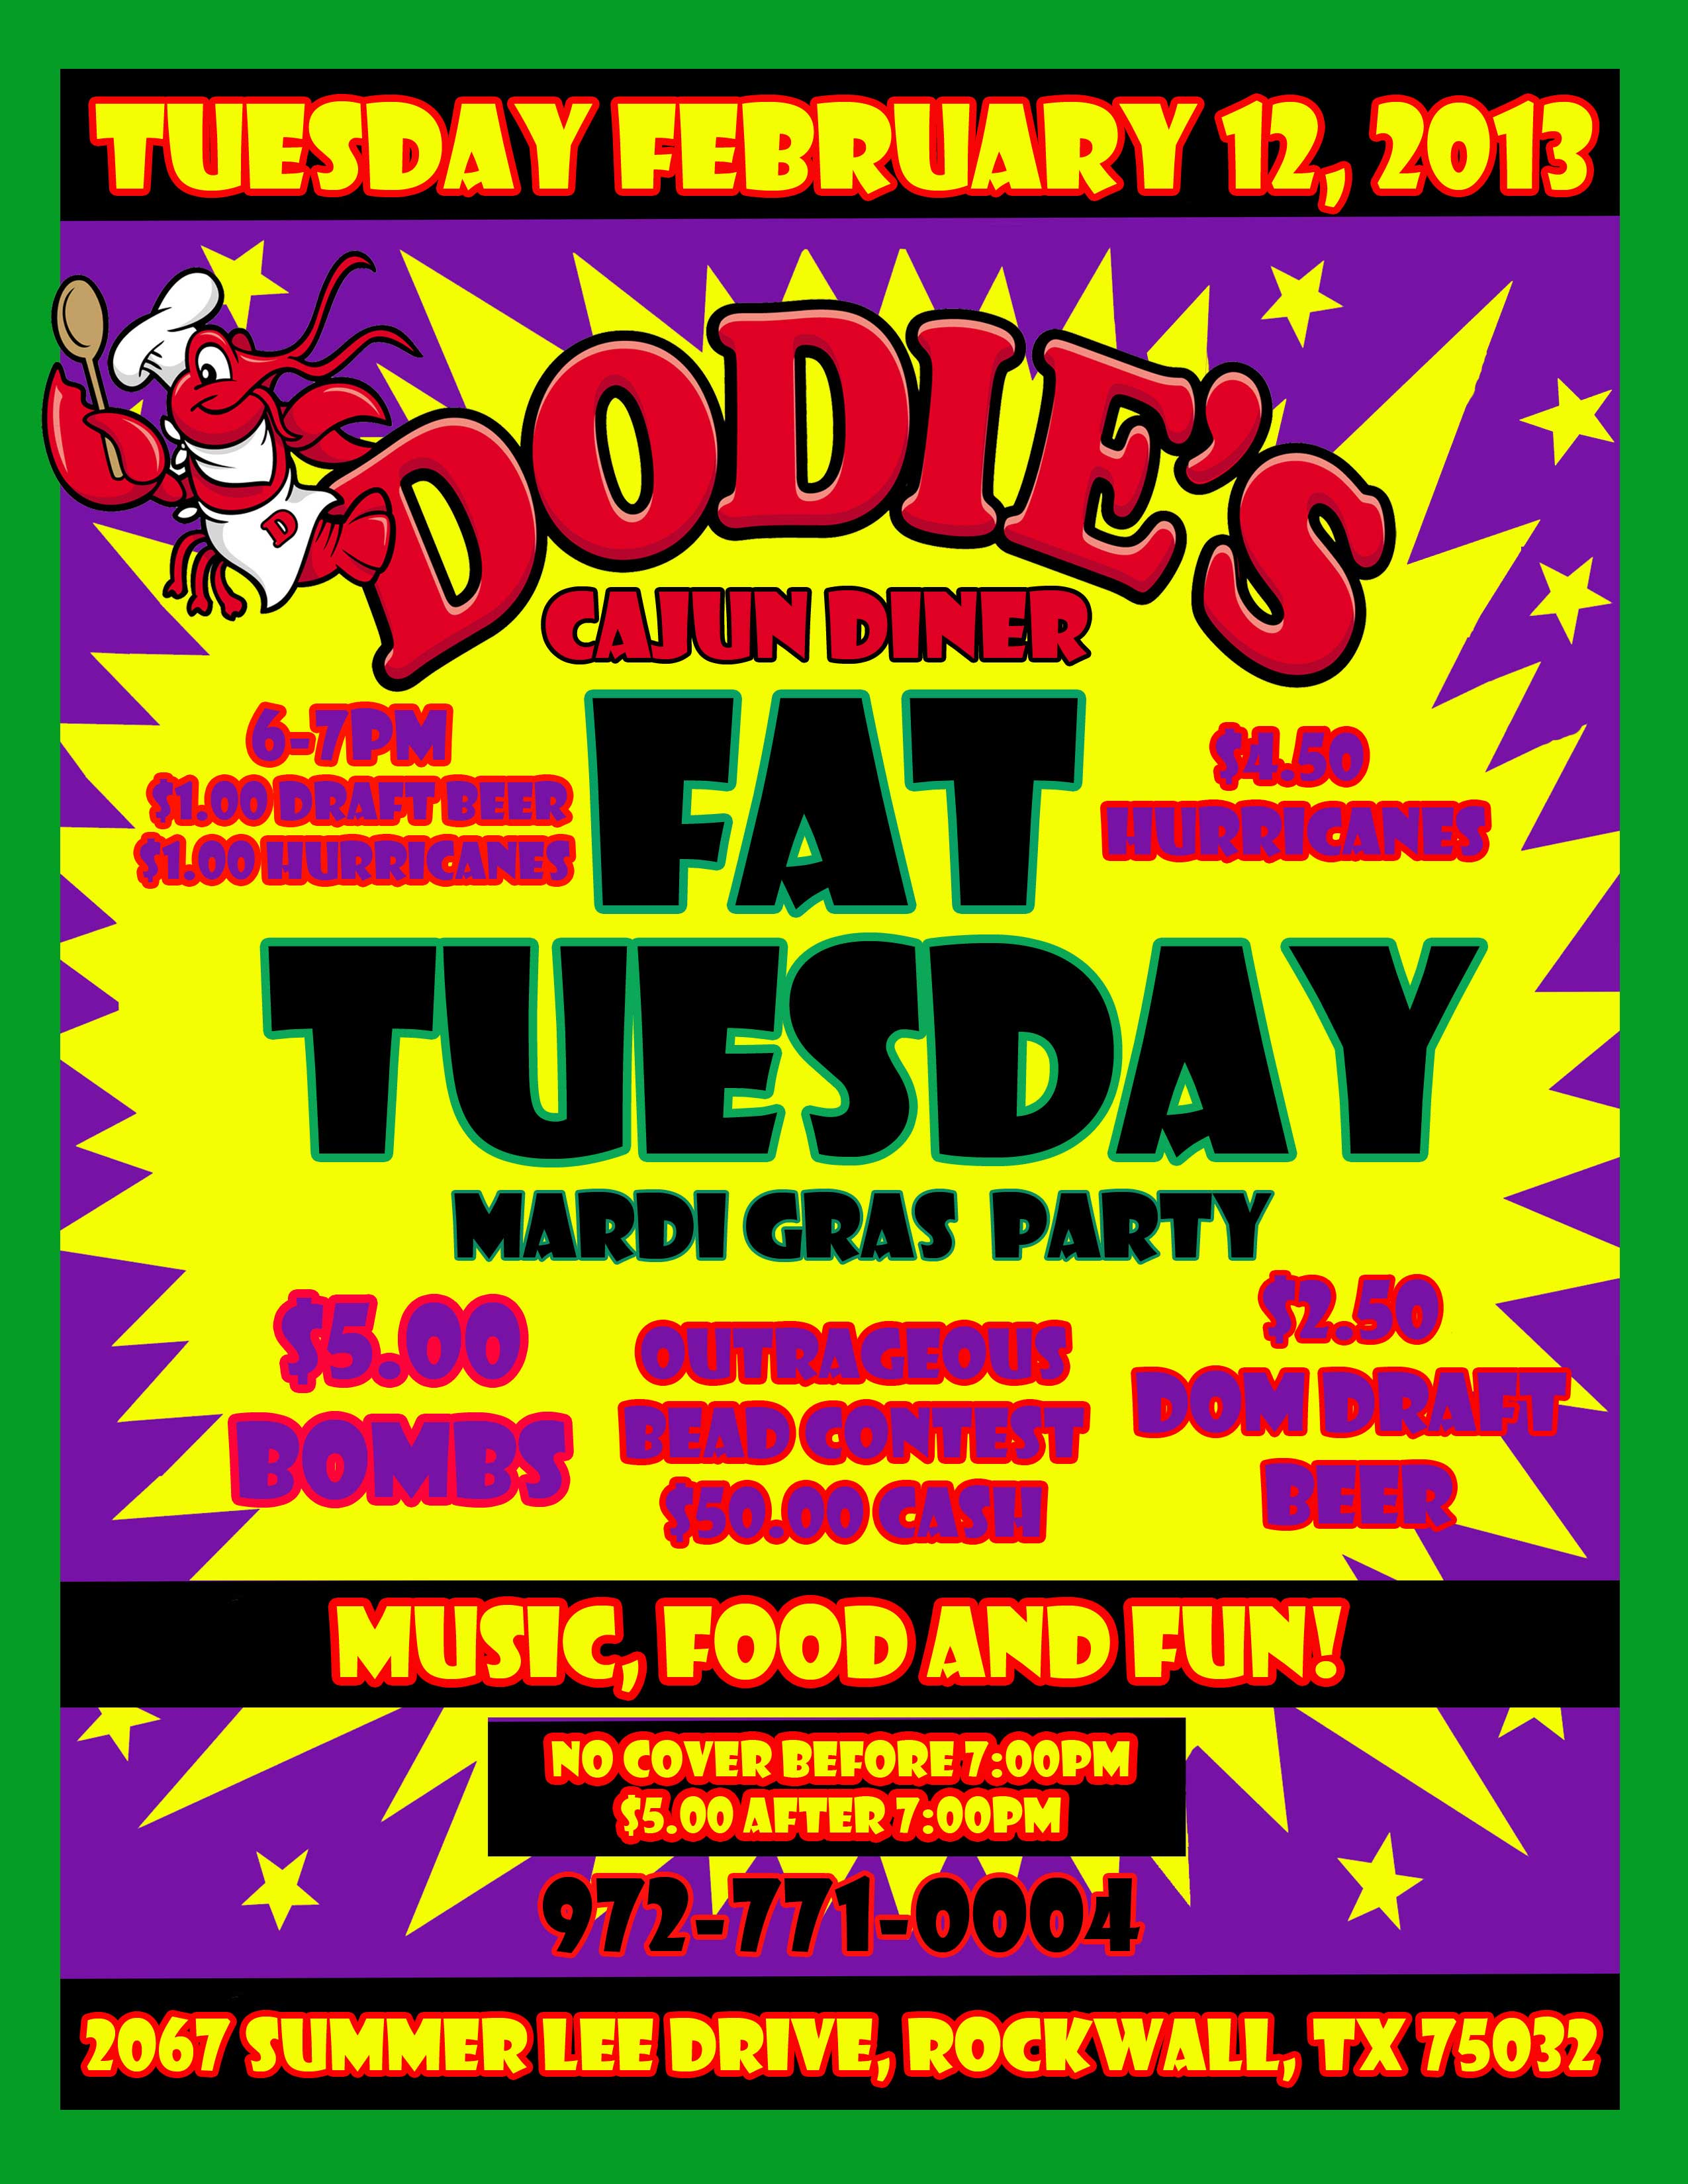 Dodie's-Mardi-Gras-Poster-v2-02_06_2013-LG-WEB-